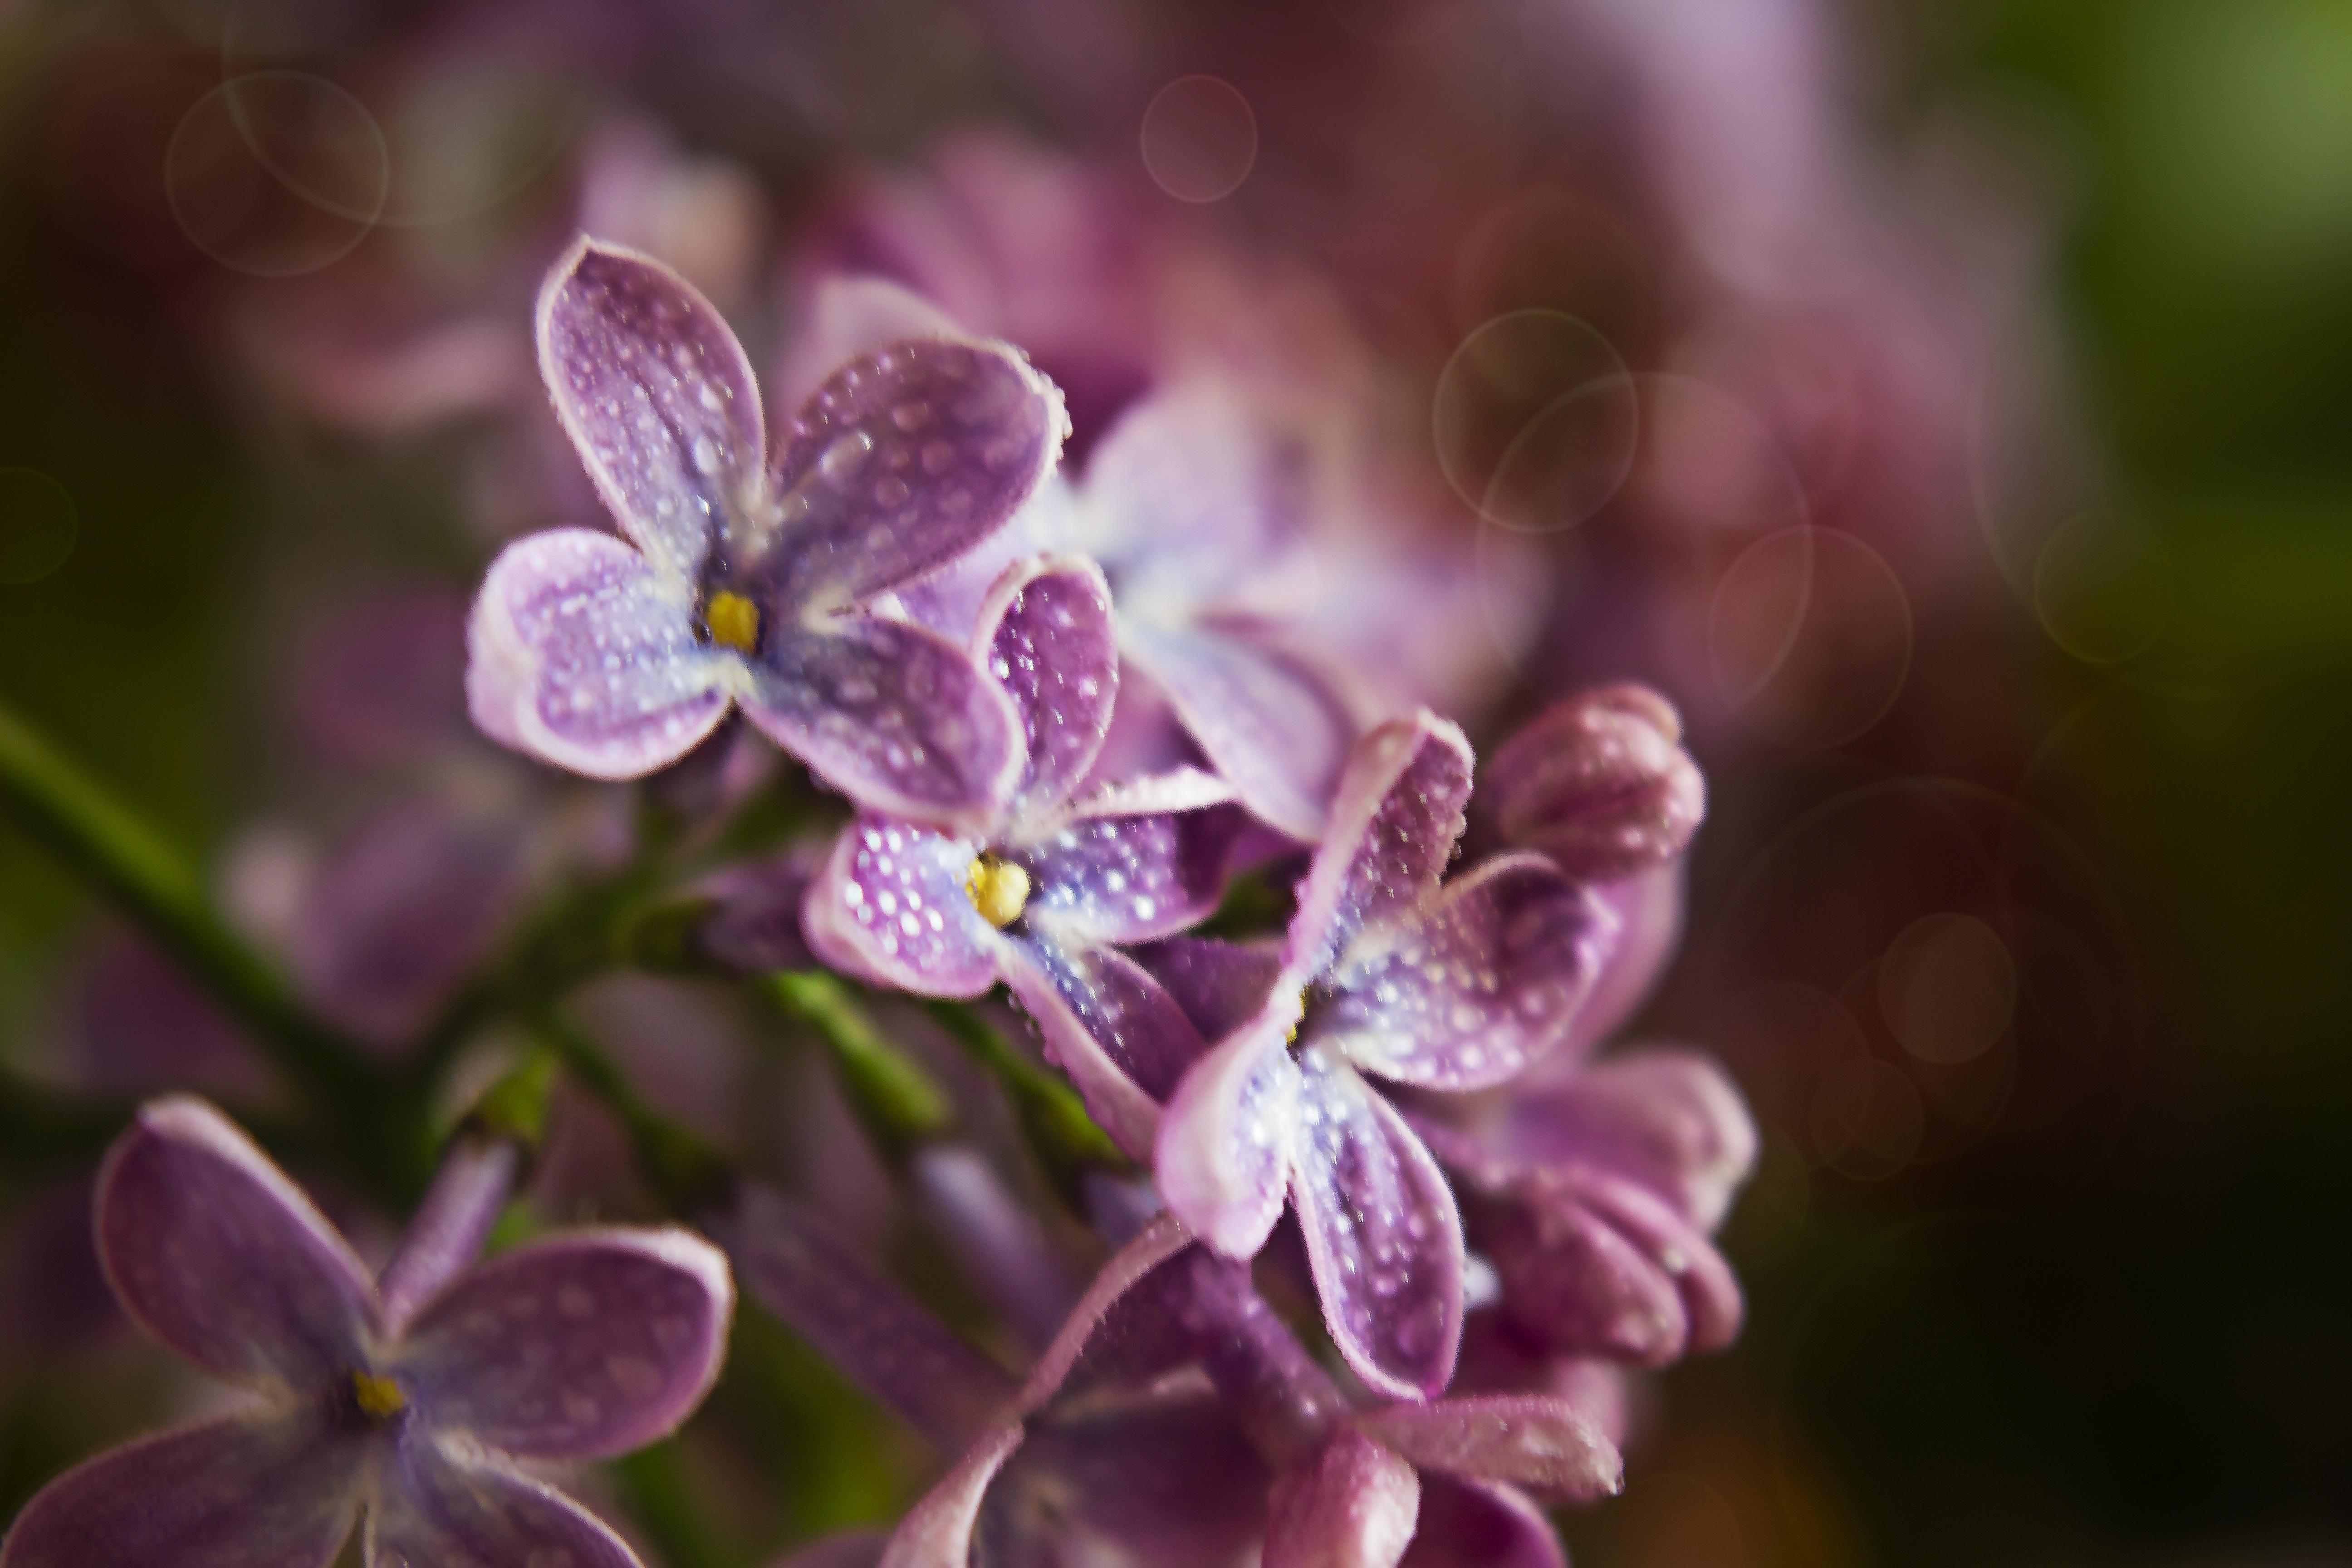 fond d'ecran gratuit lilas blanc